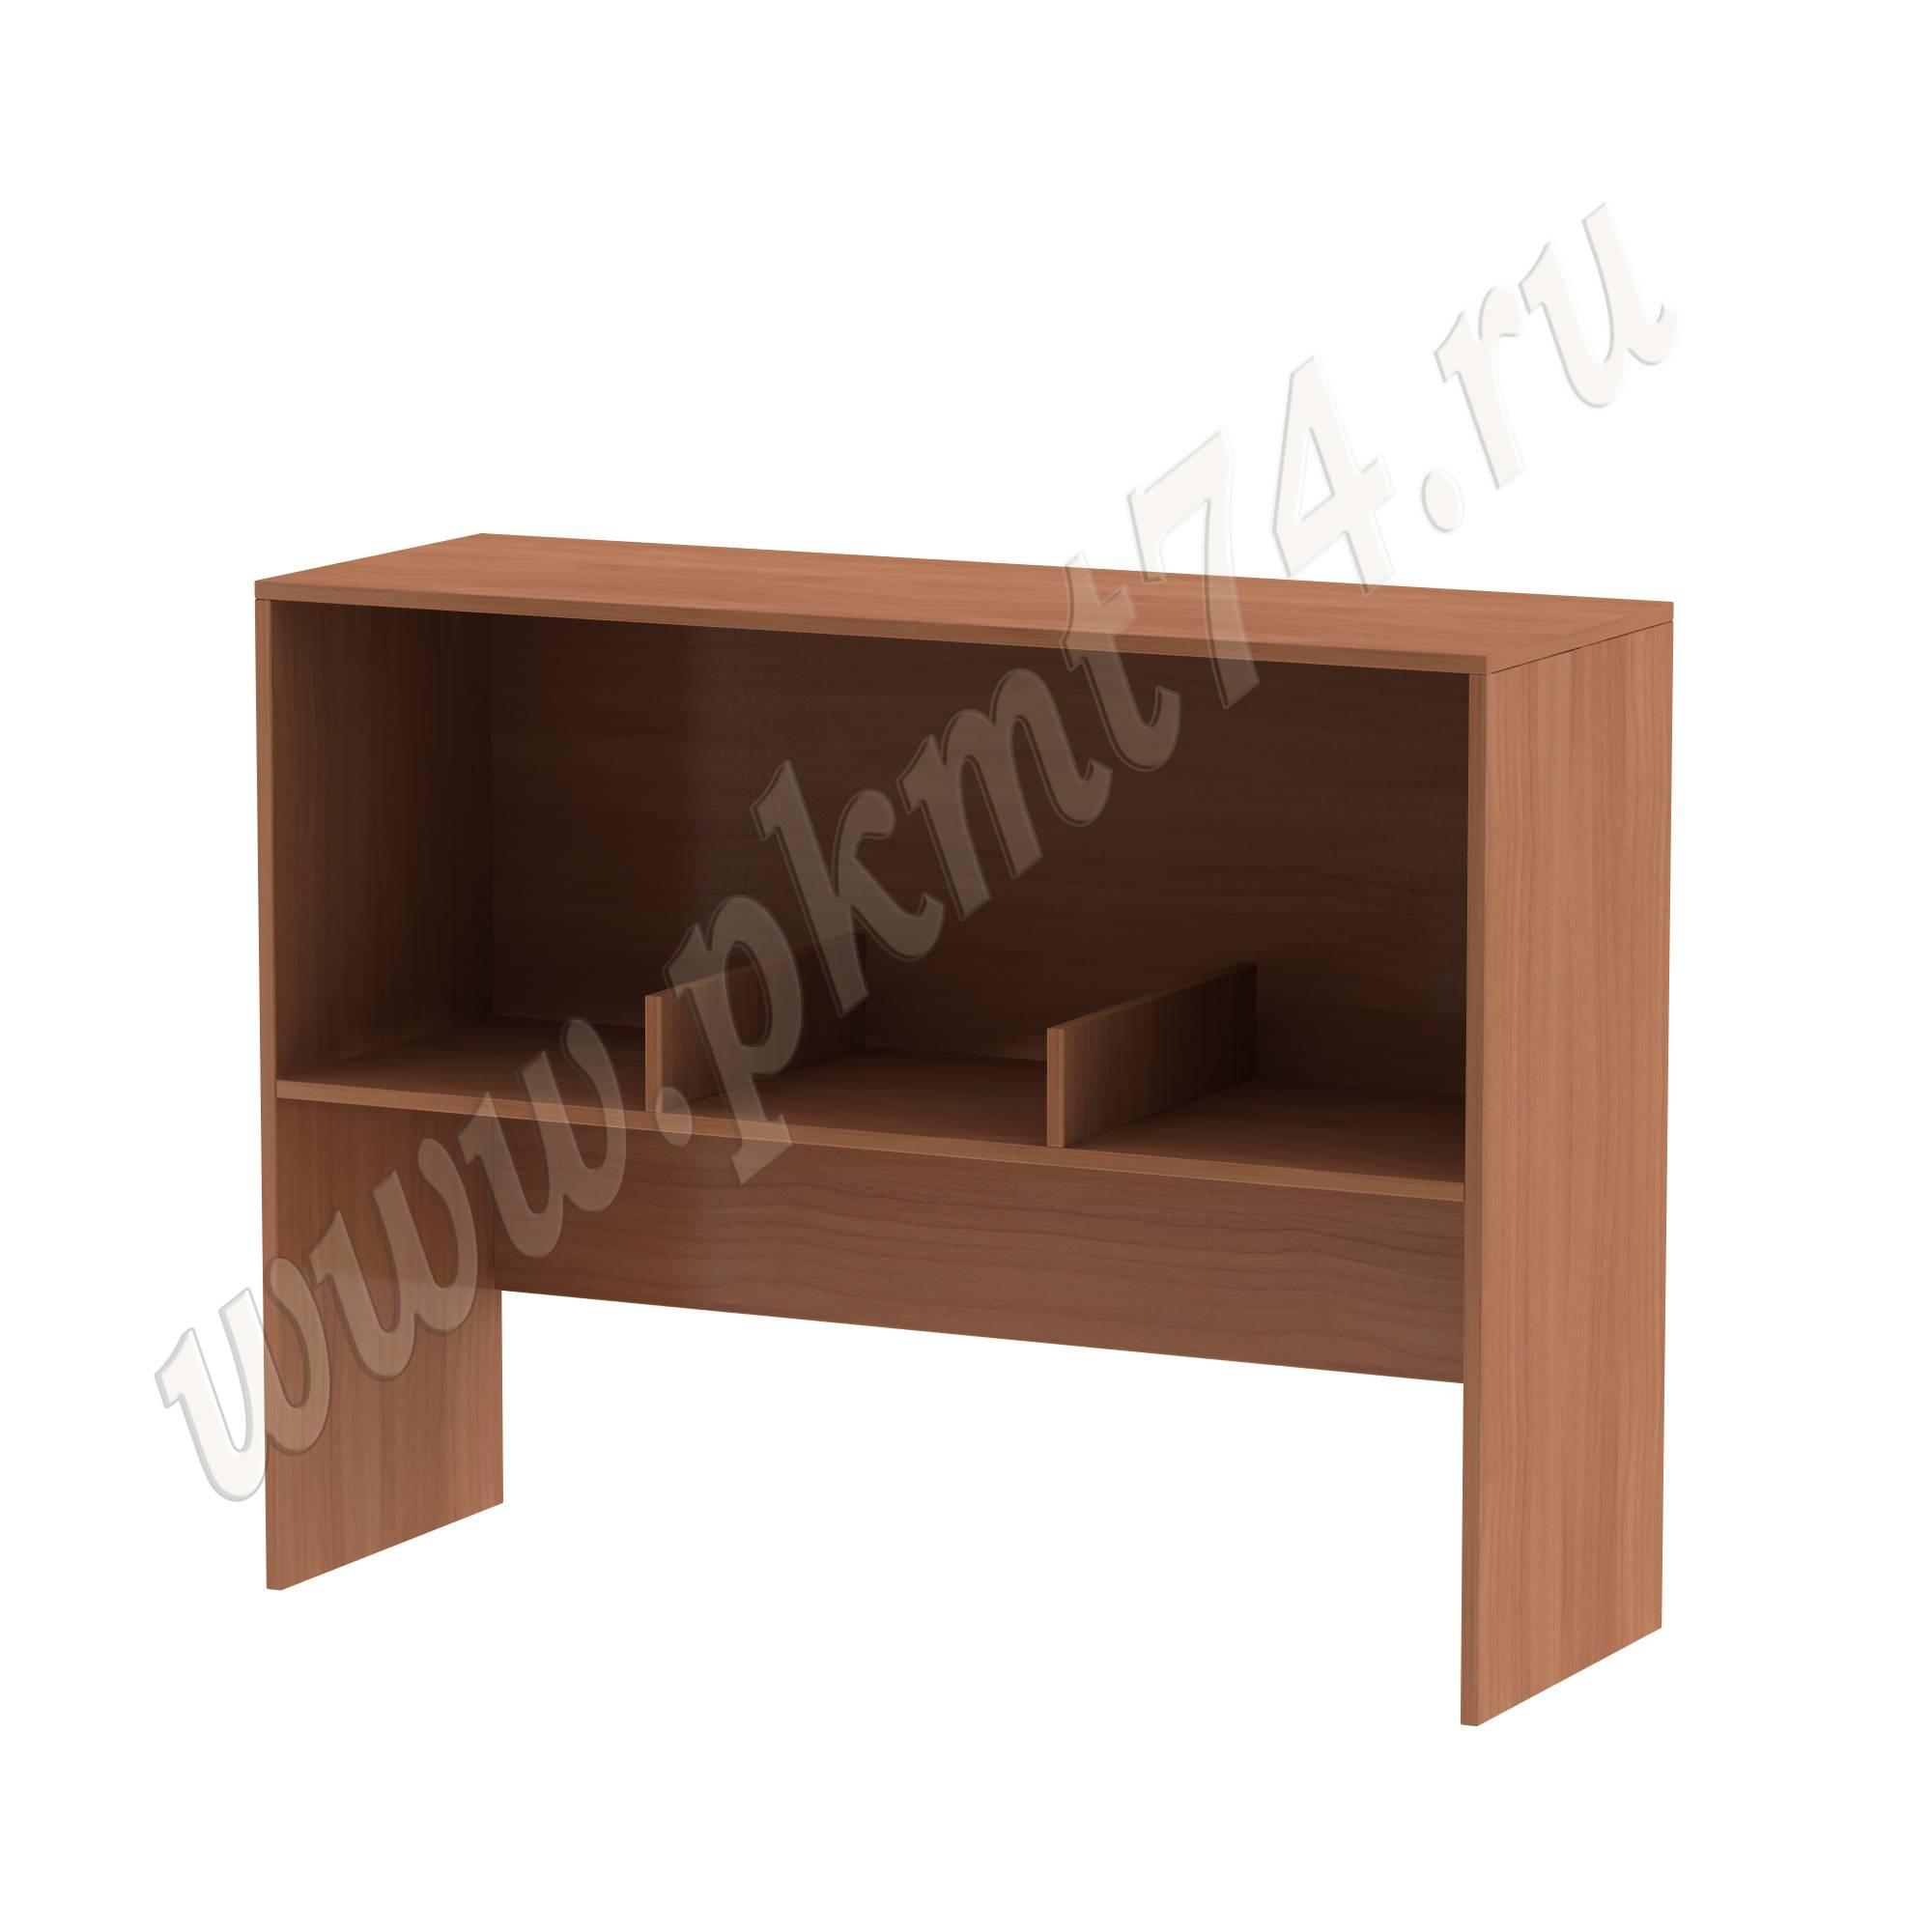 Стол для выдачи книг [Цвет ЛДСП:: Вишня Оксфорд]